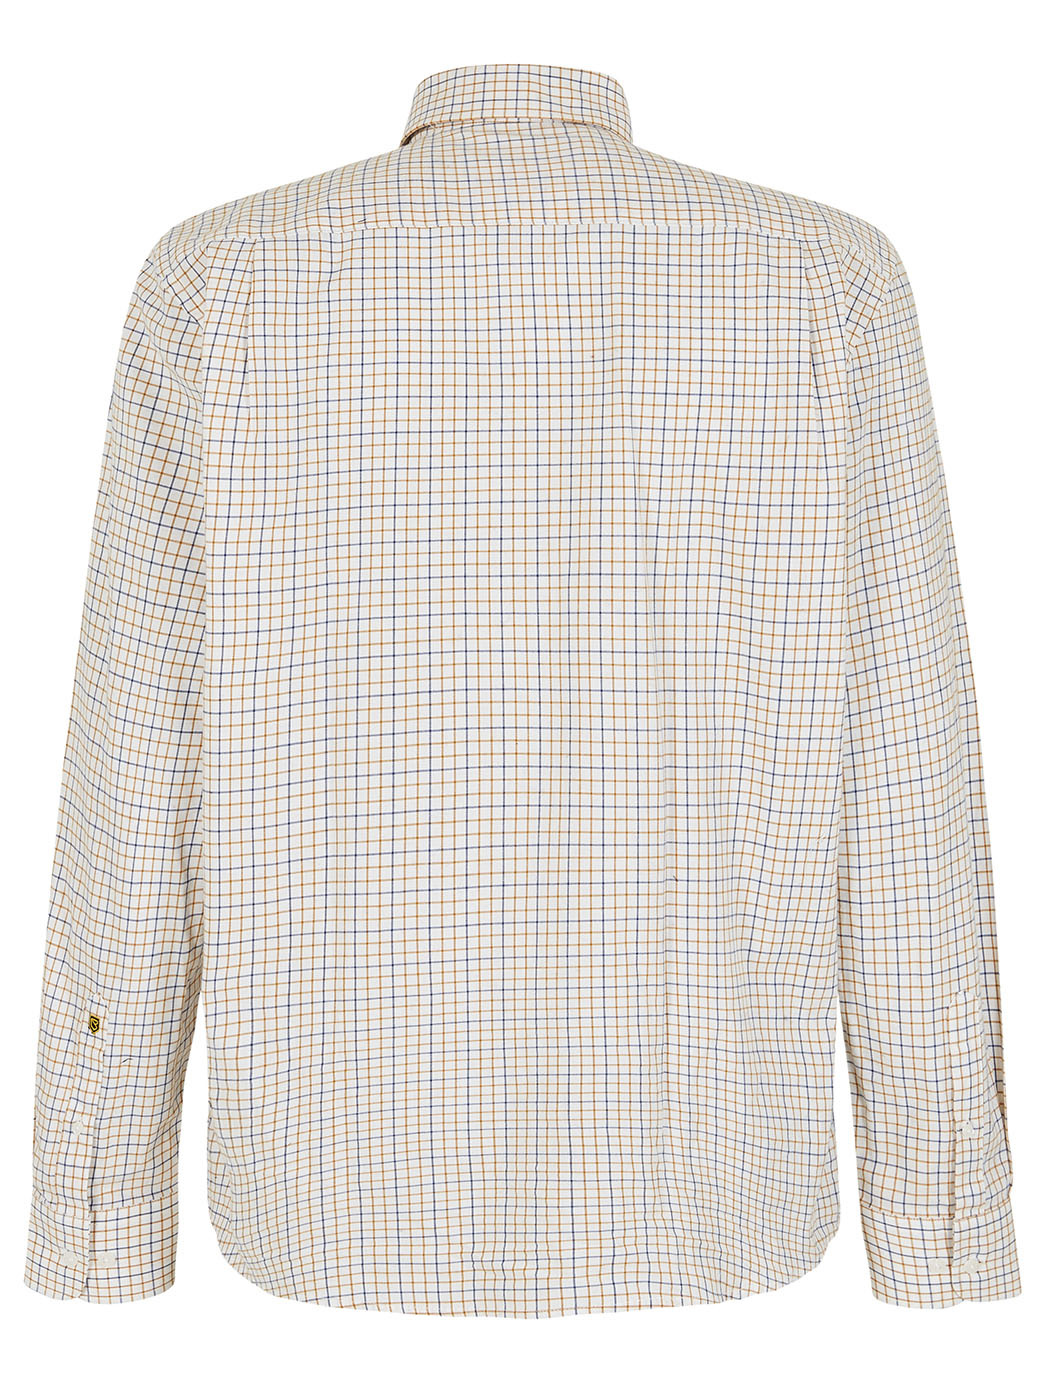 Dubarry Muckross Tattersall Shirt - Harvest-5